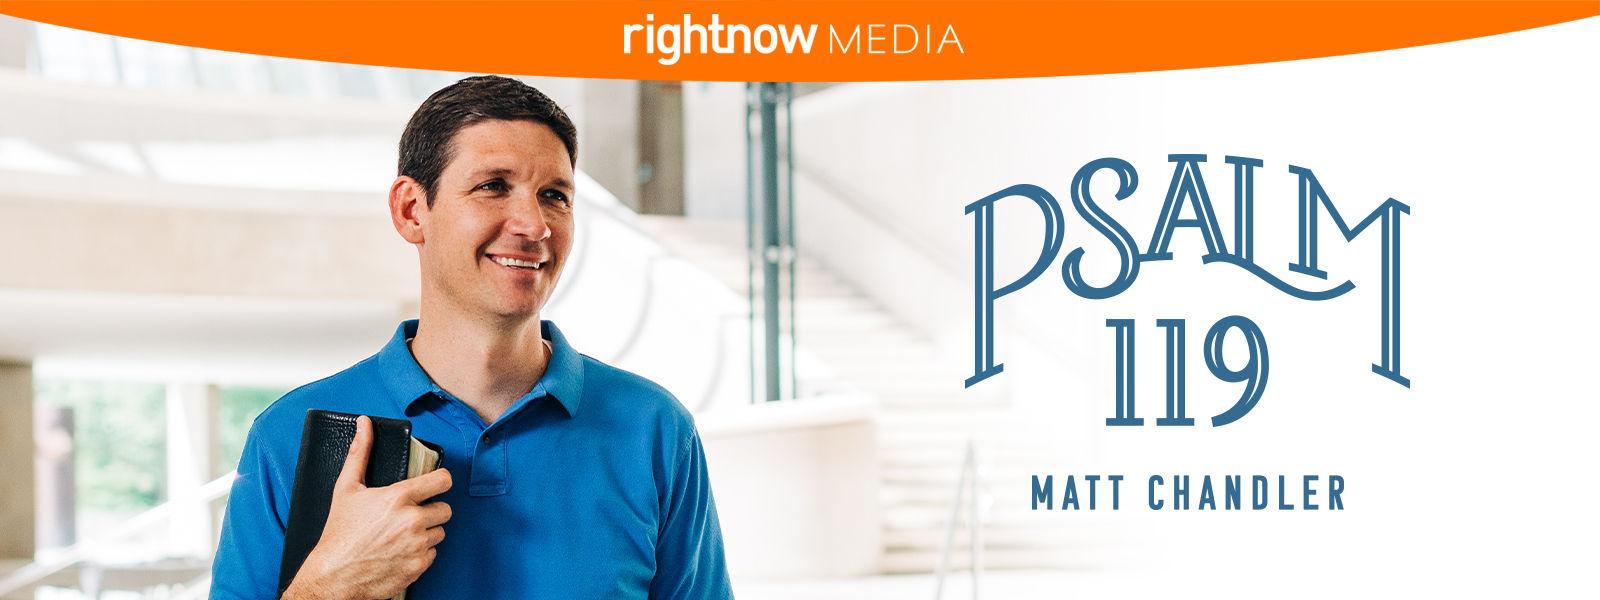 RightNow Media :: Streaming Video Bible Study : Psalm 119 : Matt